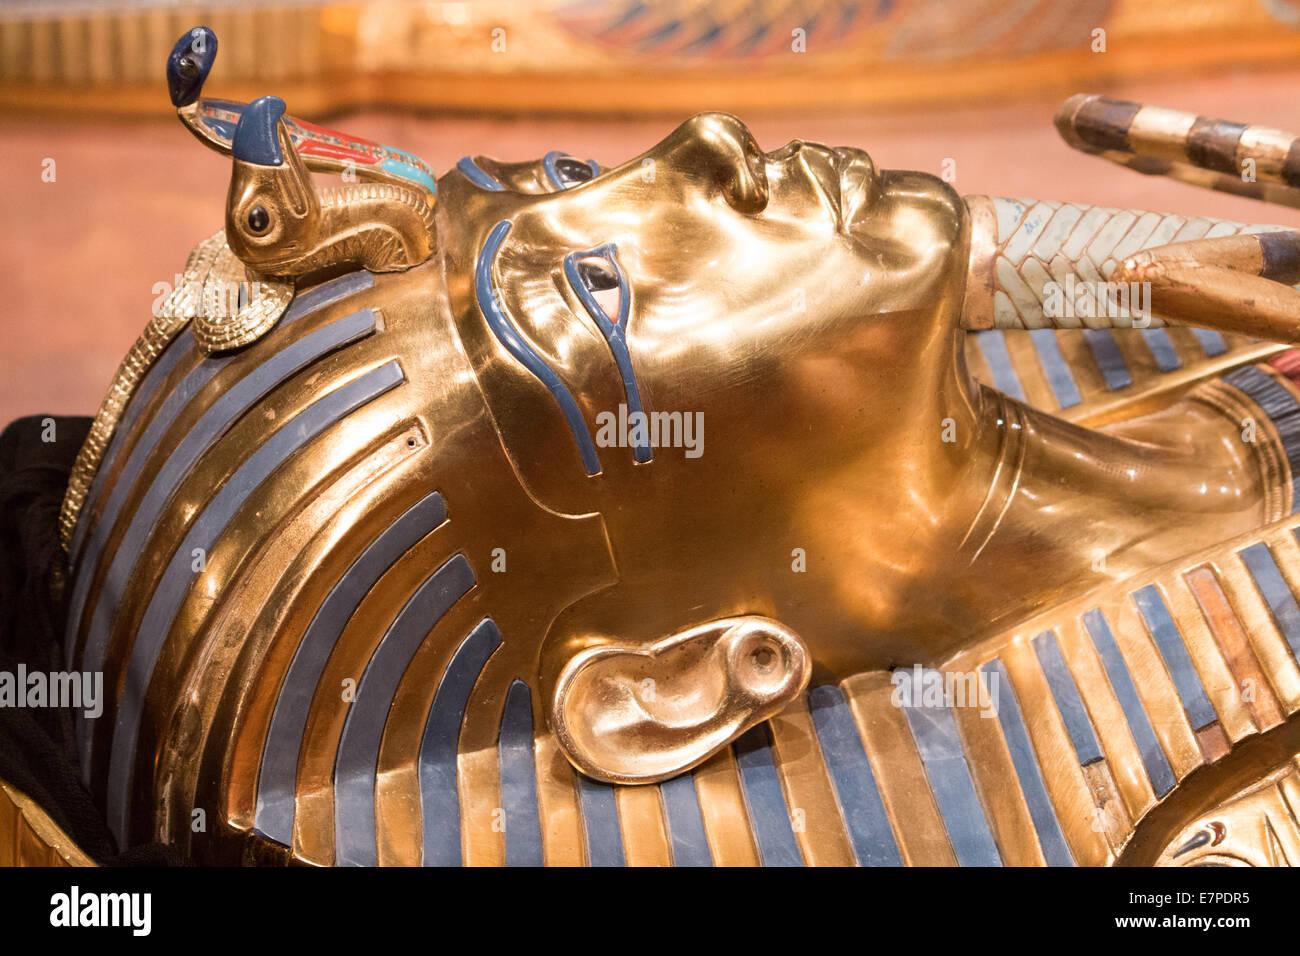 King tut head shot laying down - Stock Image